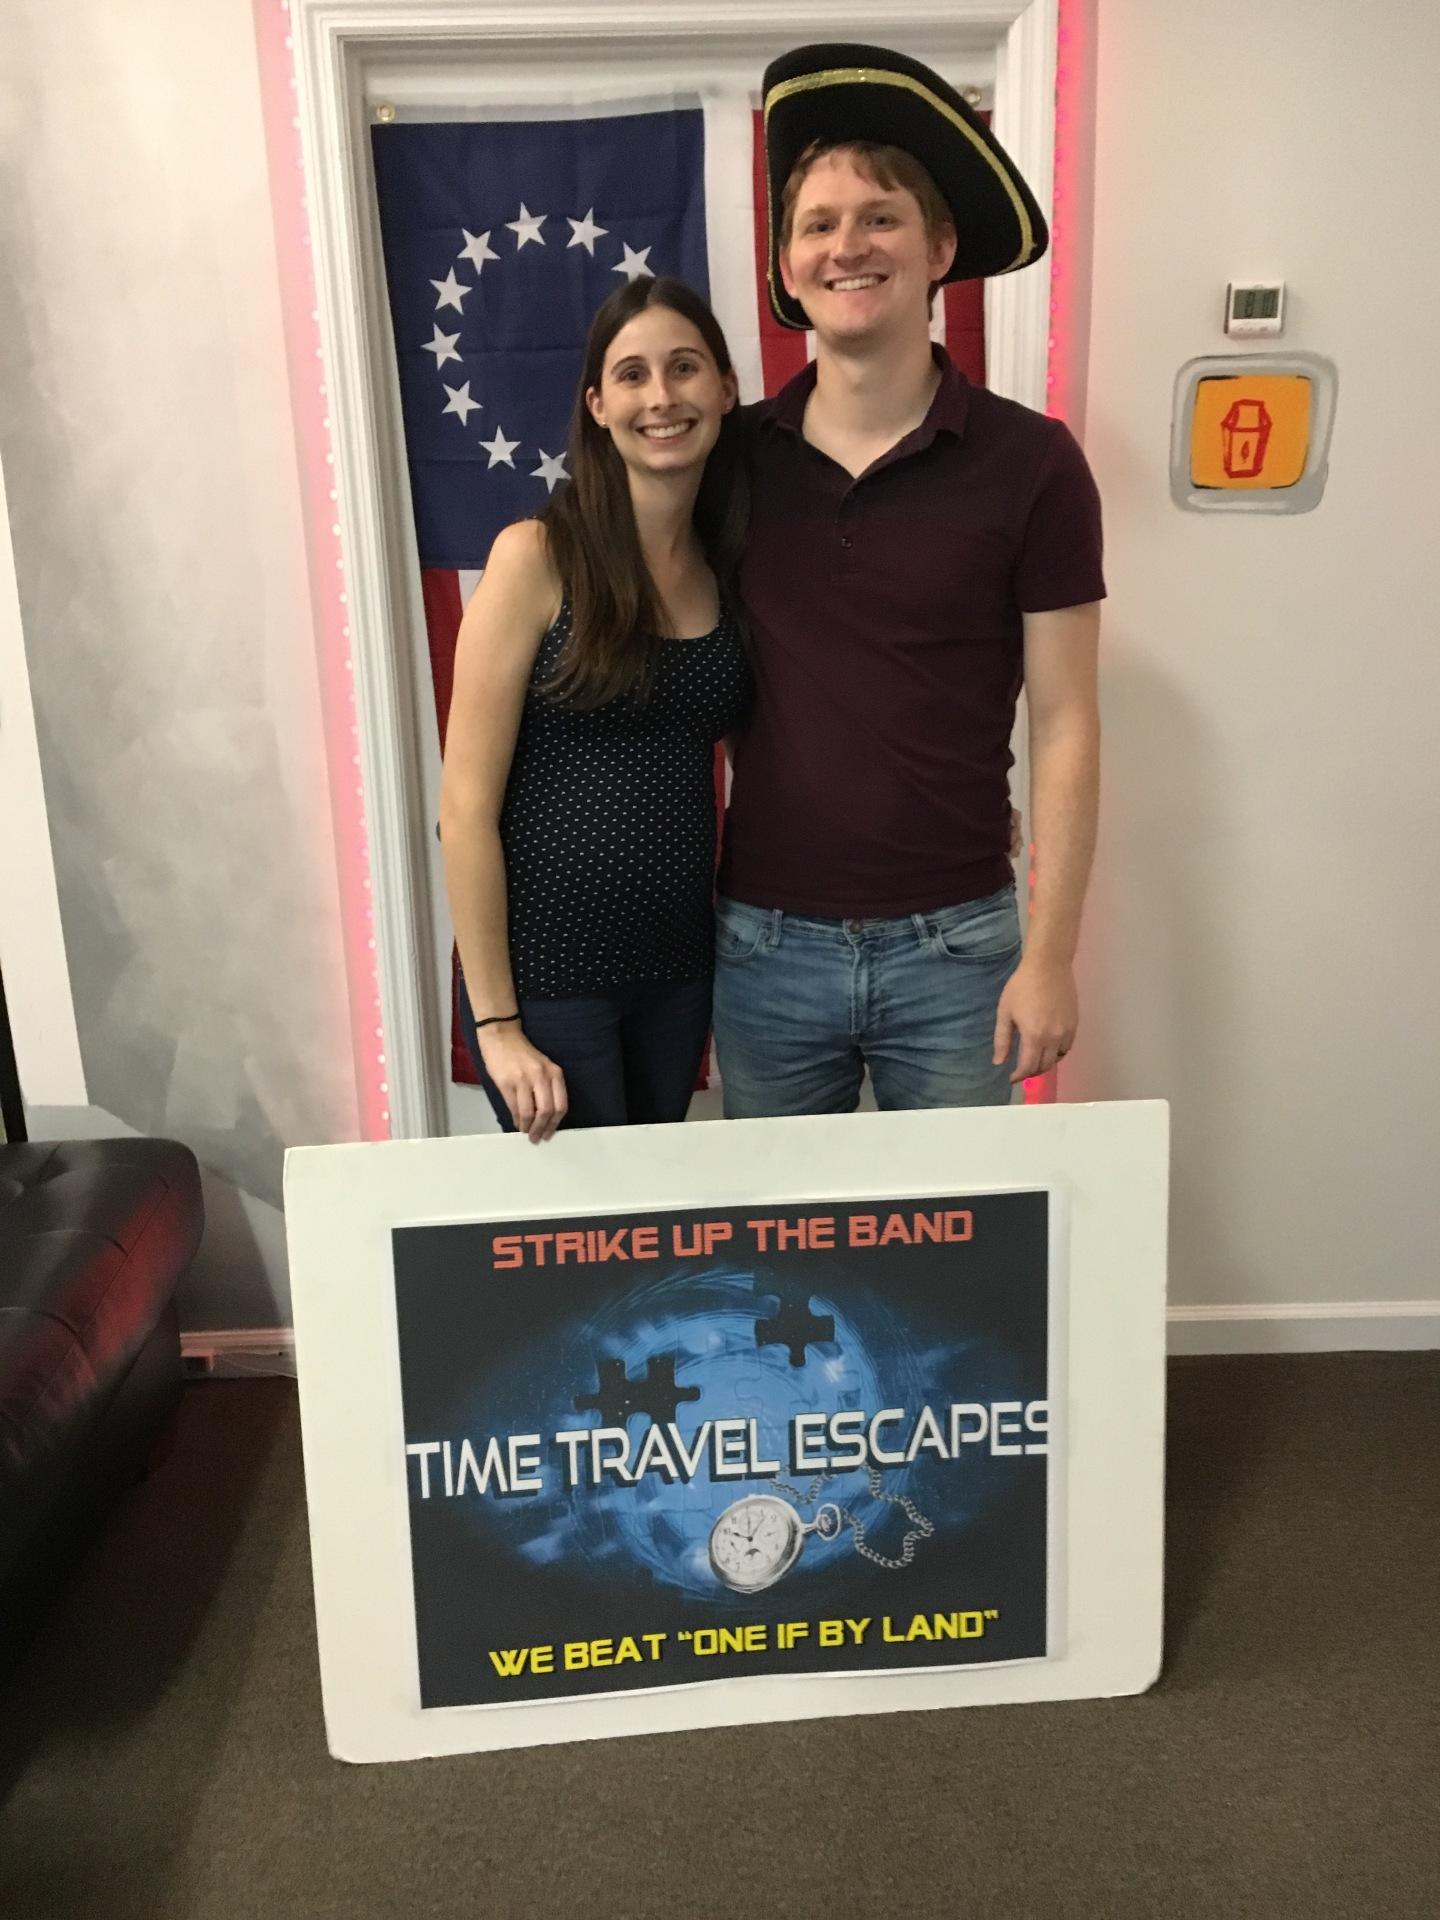 Jeff & Becky Save The Nation